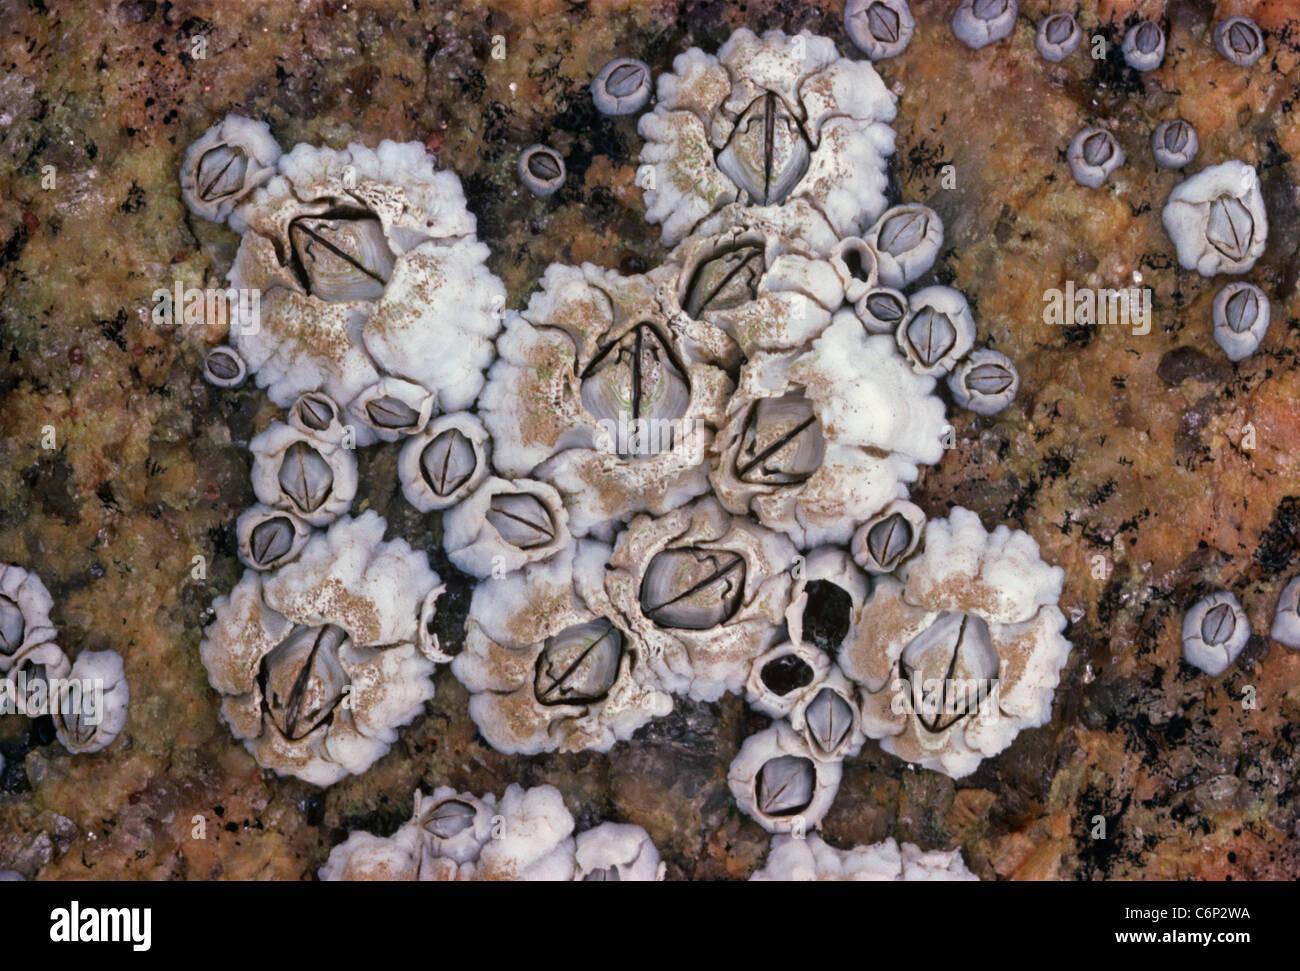 Colony of Acorn Barnacles (Semibalanus balanoides) filter feeding. Galapagos Islands, Ecuador, Pacific Ocean Stock Photo